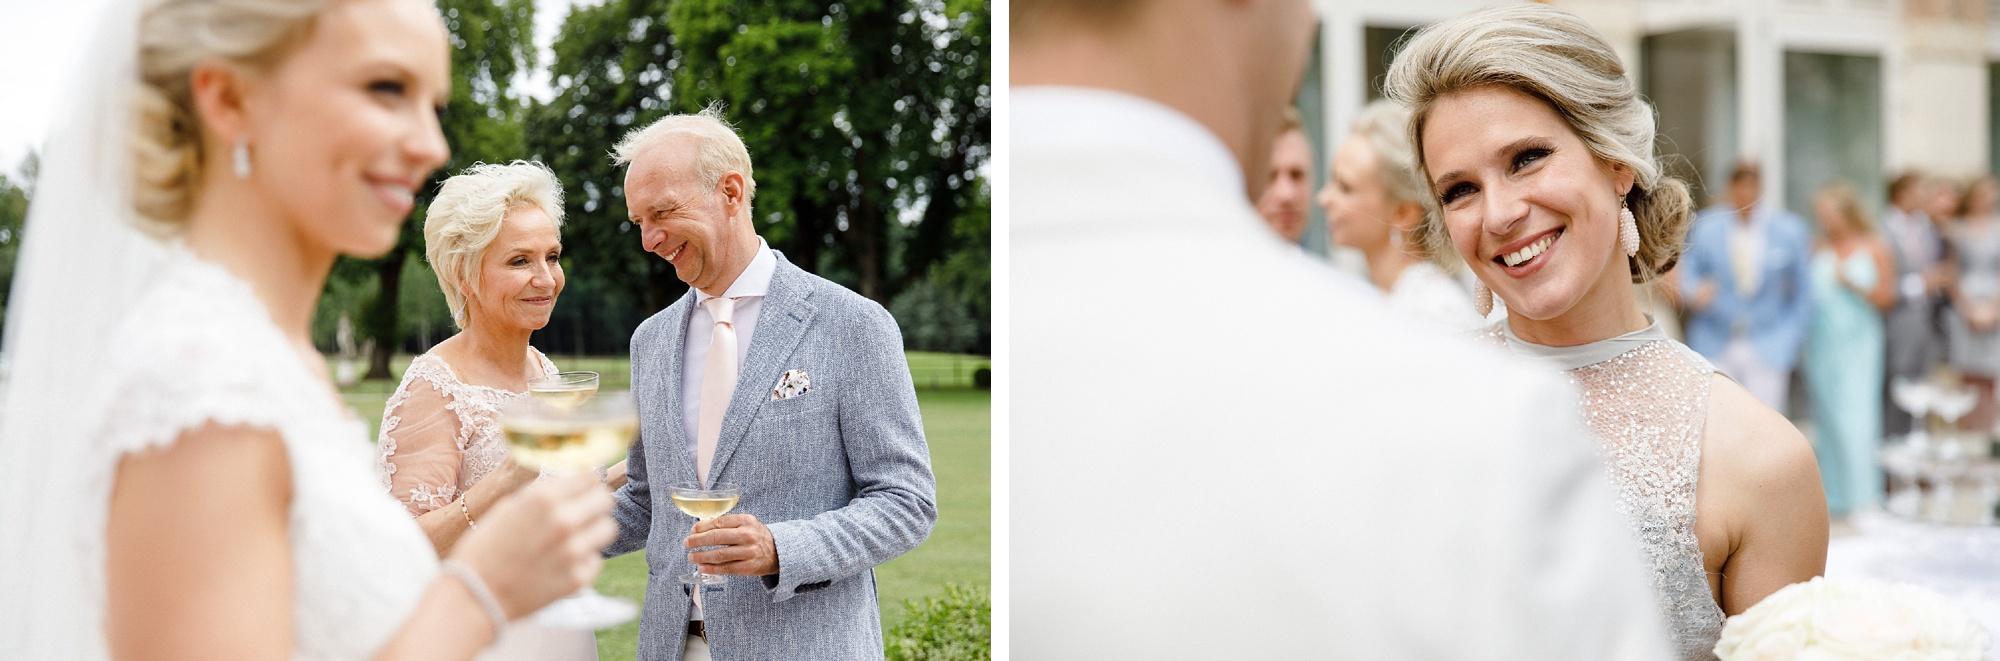 Wedding-Chateau-de-Varennes-058.jpg